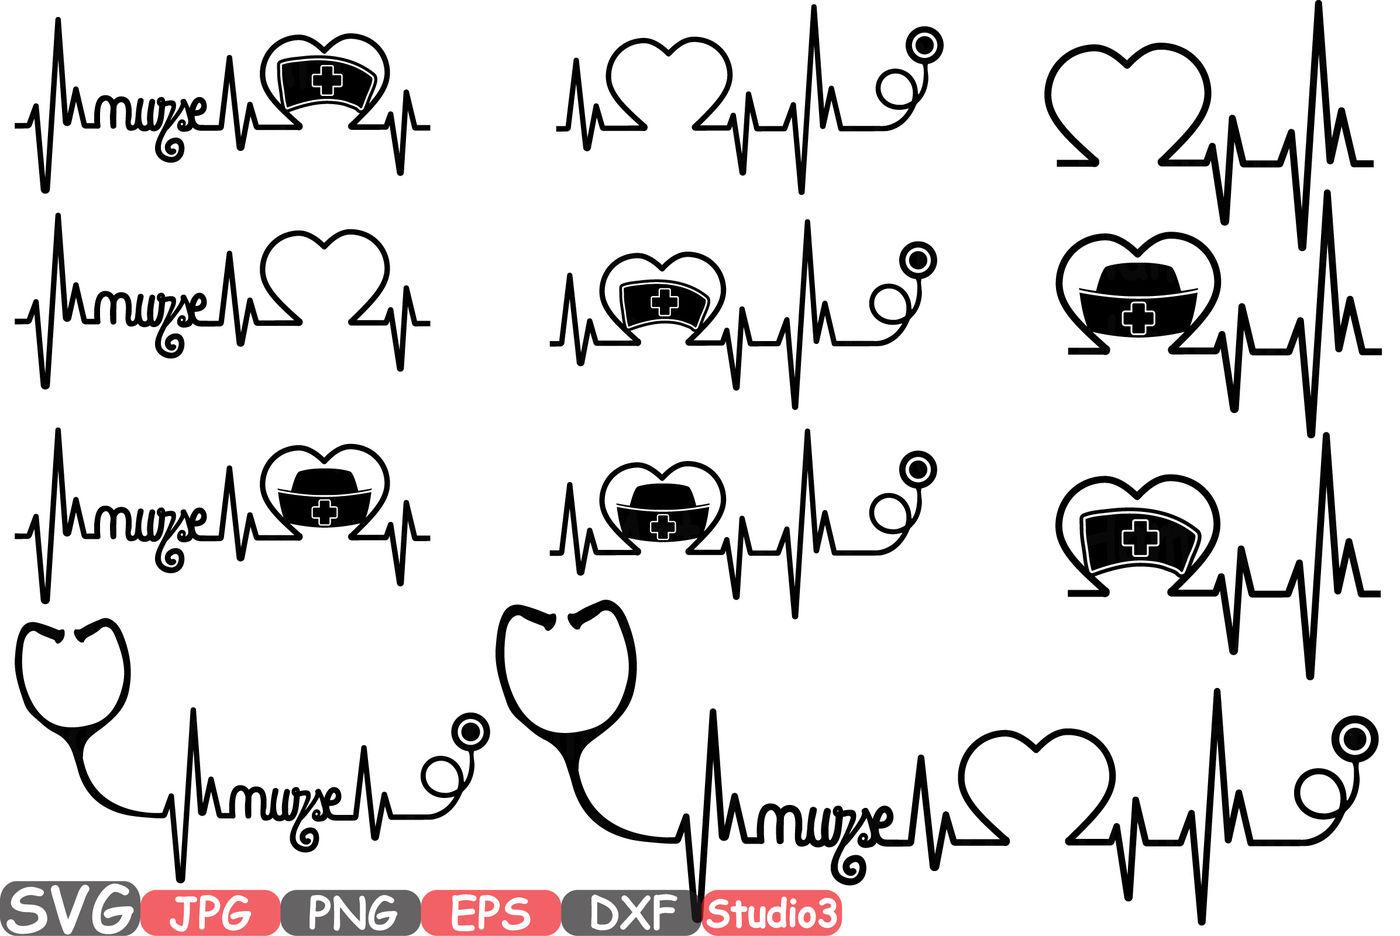 Nurses Frame Silhouette Svg Cutting Files Digital Clip Art Graphic Studio3 Cricut Cuttable Die Cut Machines Nursing Nurse Stethoscope 37sv By Hamhamart Thehungryjpeg Com